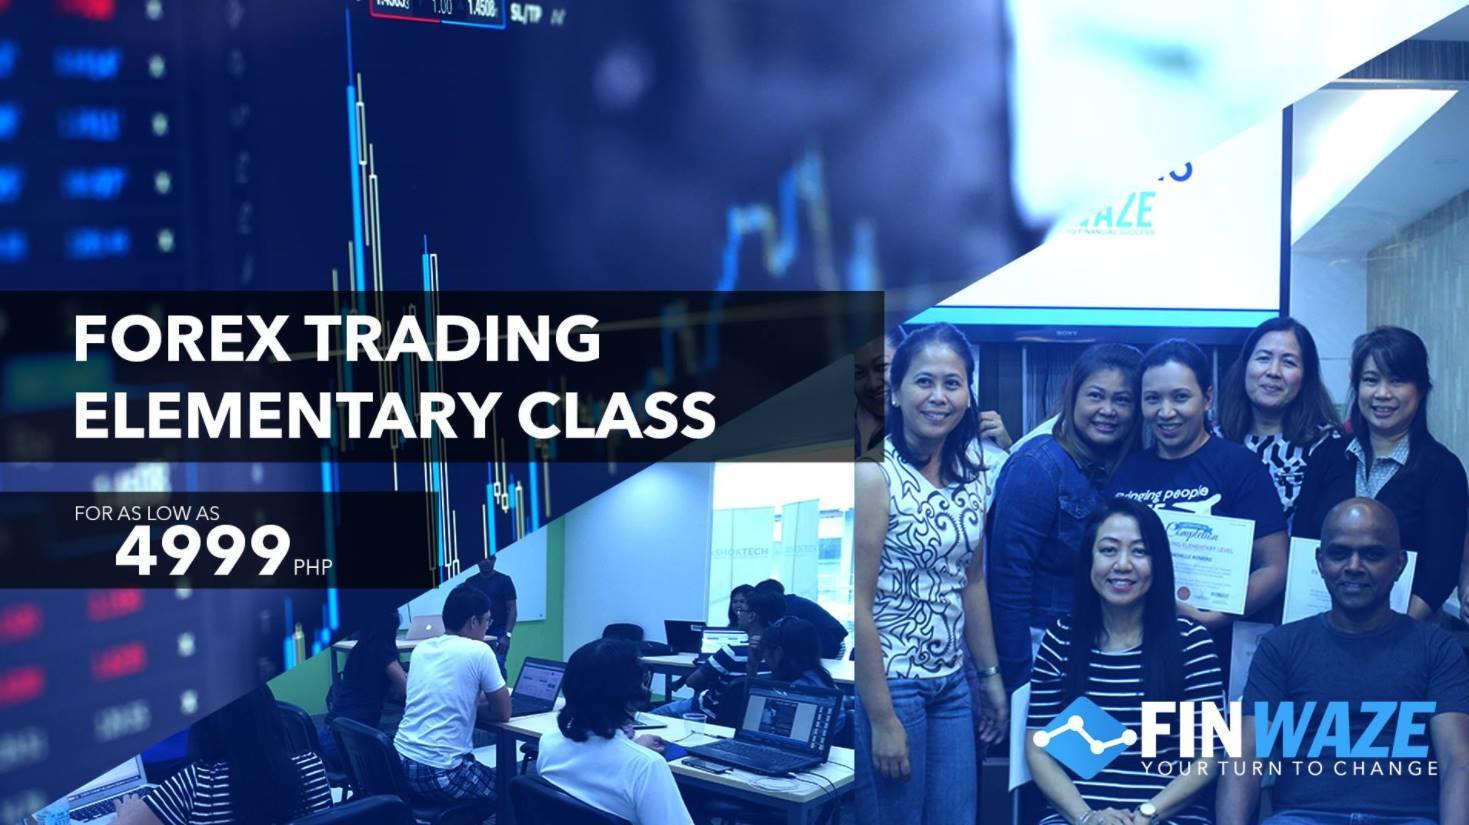 finwaze forex trading classes review